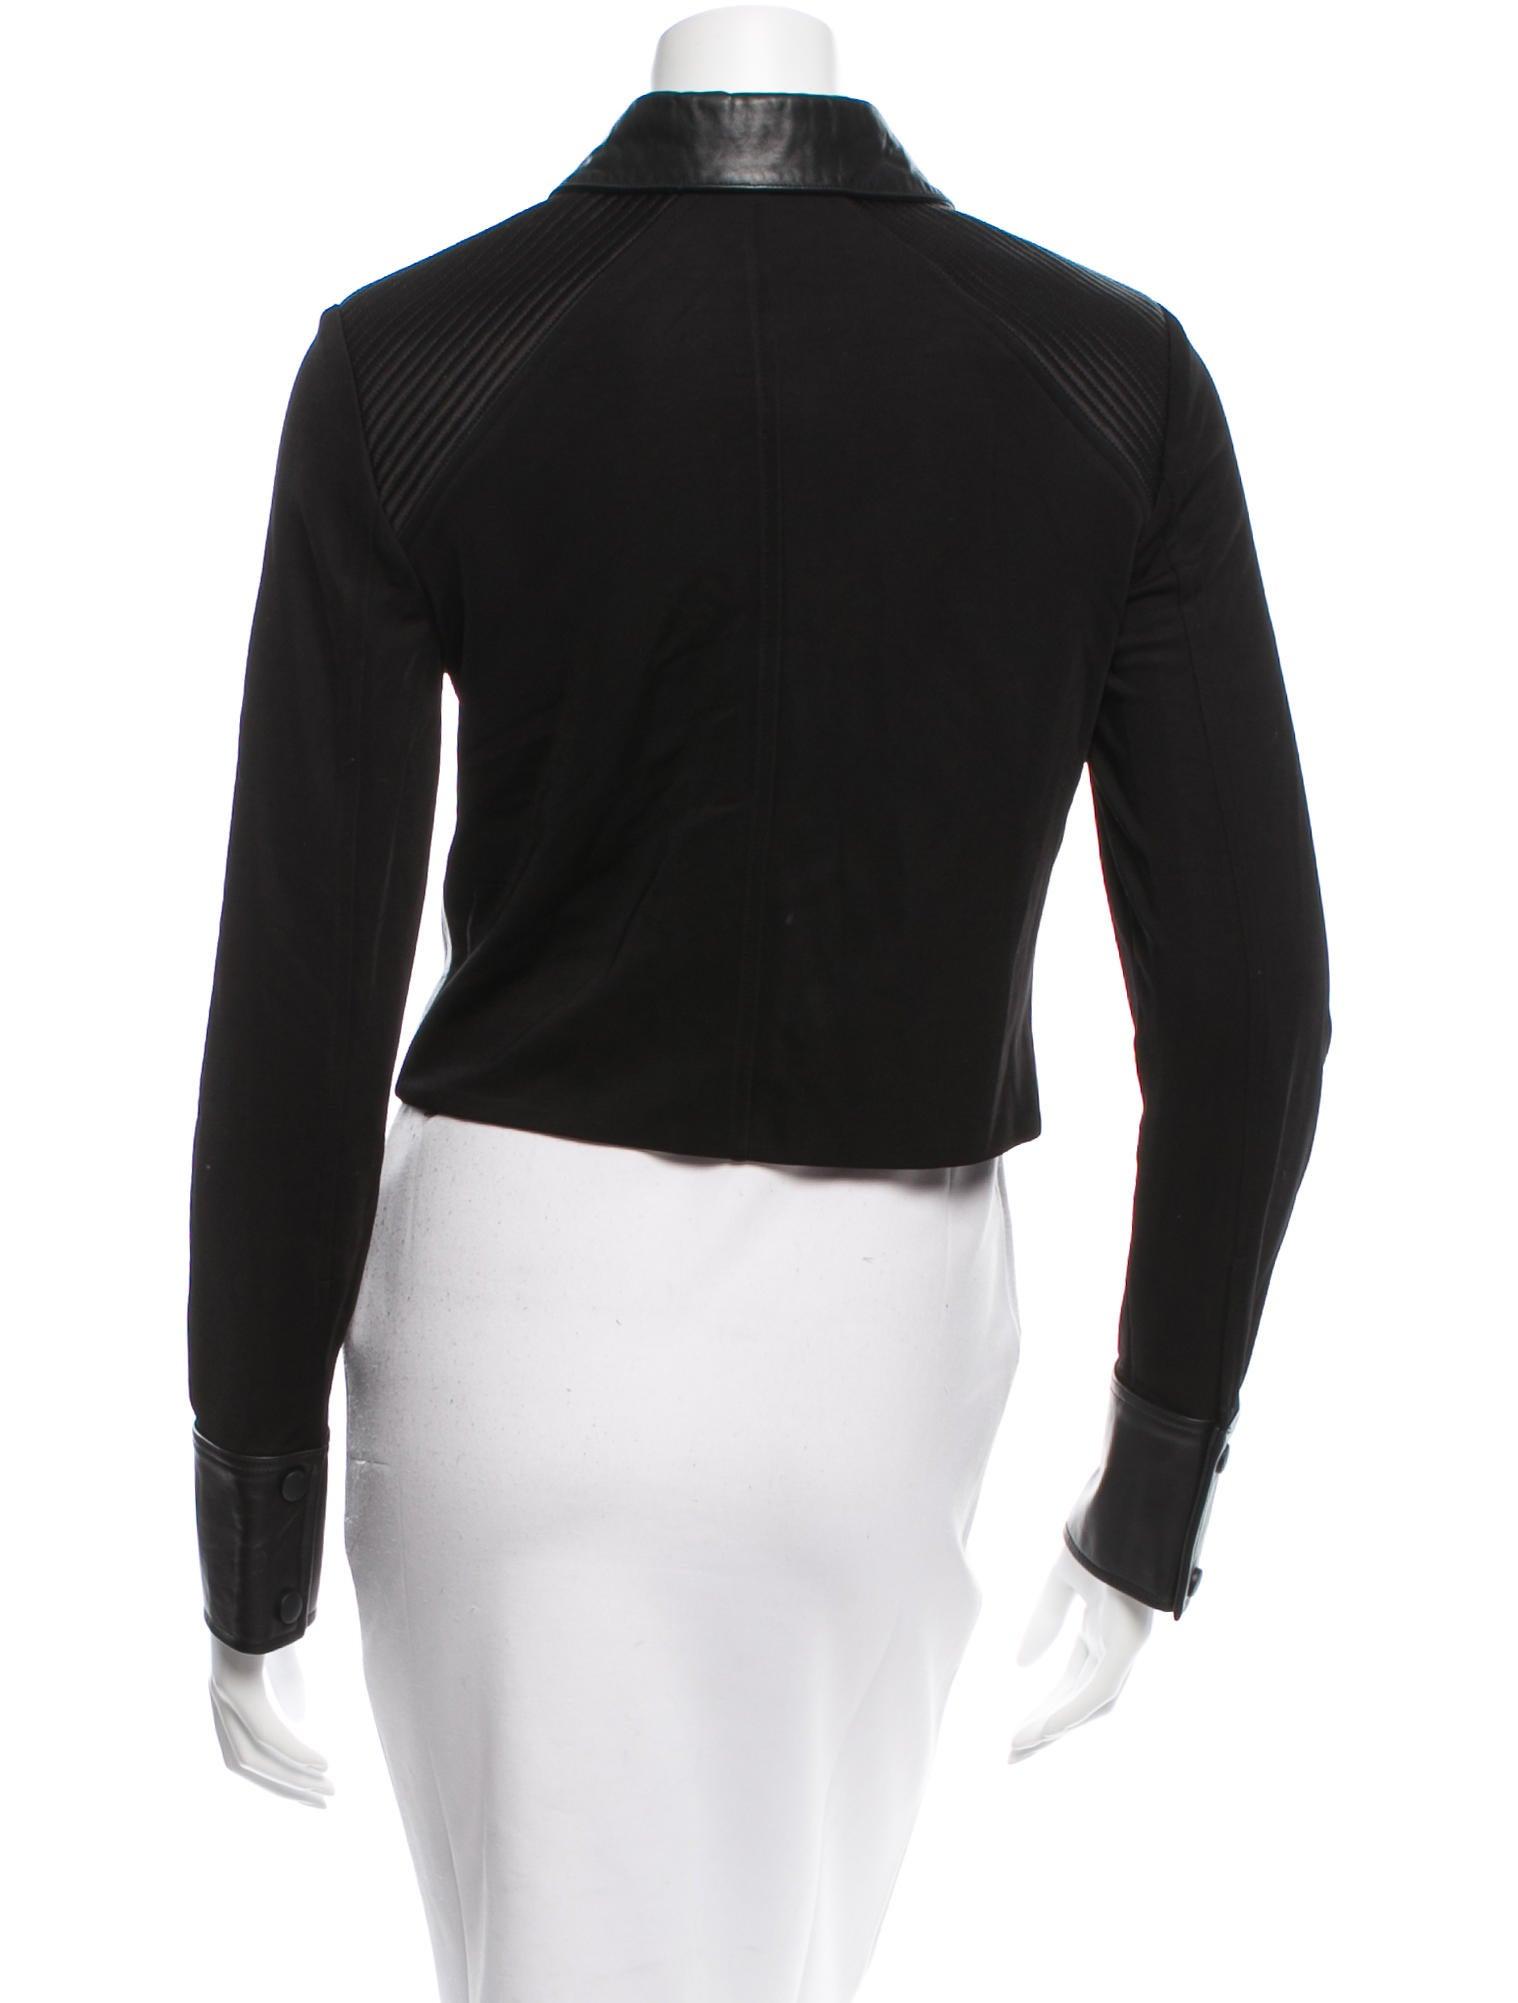 Casadei Light Weight Long Sleeve Jacket Clothing